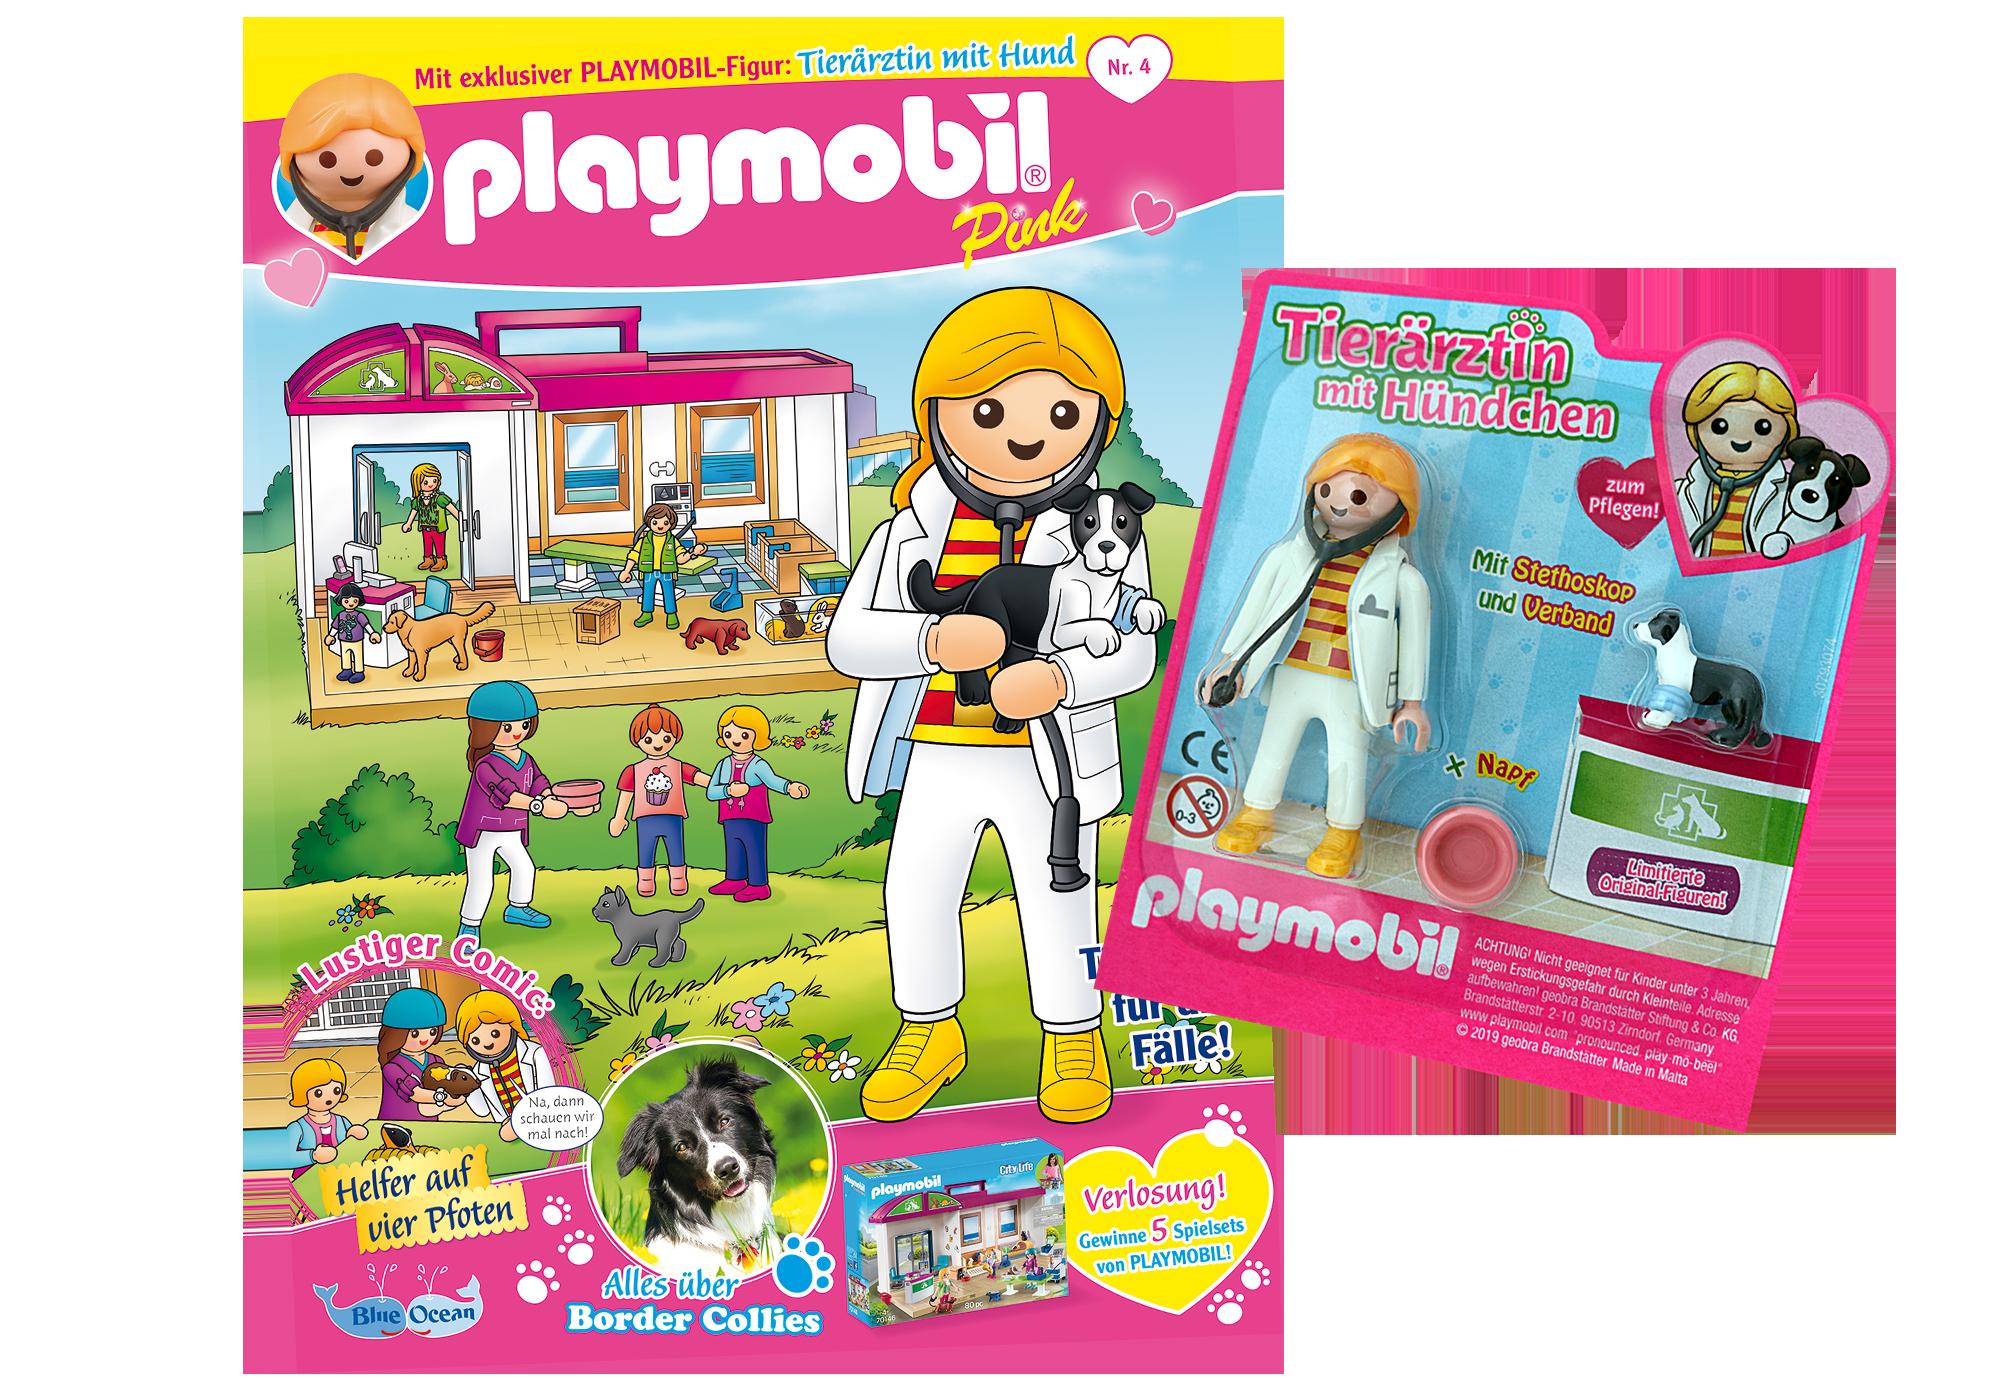 http://media.playmobil.com/i/playmobil/80627_product_detail/PLAYMOBIL-Magazin Pink 4/2019 (Heft 44)